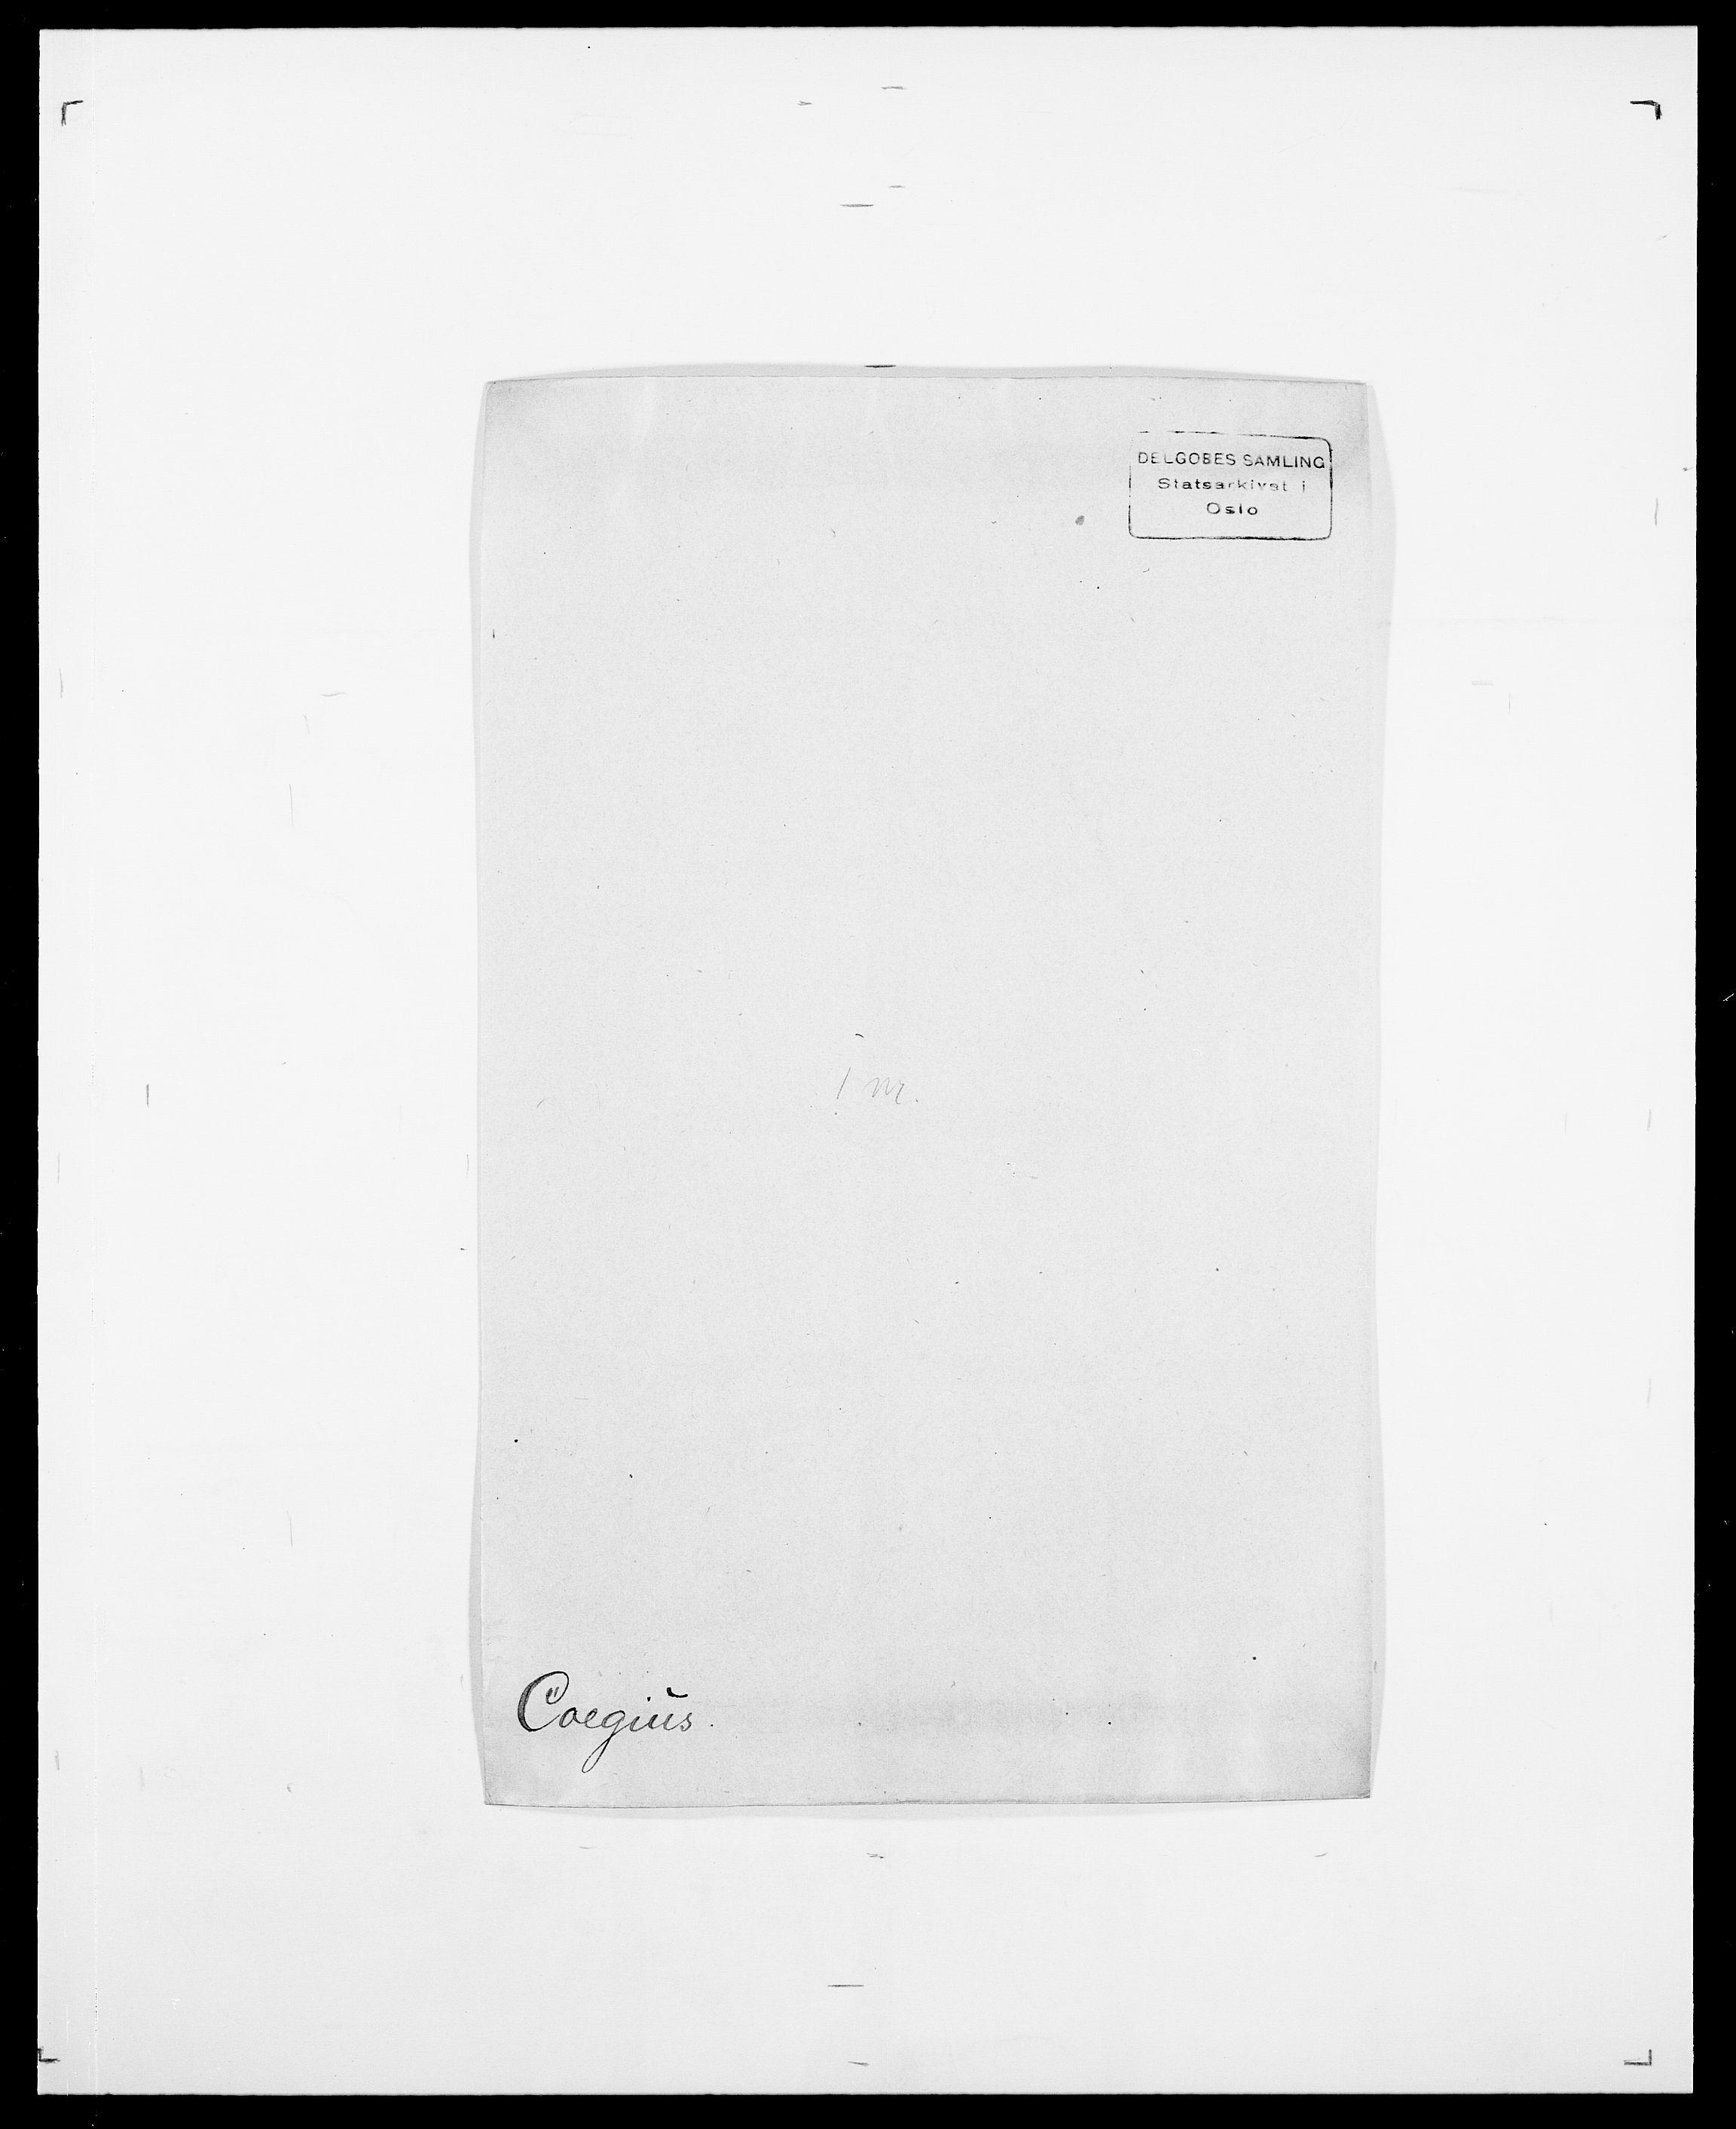 SAO, Delgobe, Charles Antoine - samling, D/Da/L0008: Capjon - Dagenbolt, s. 395